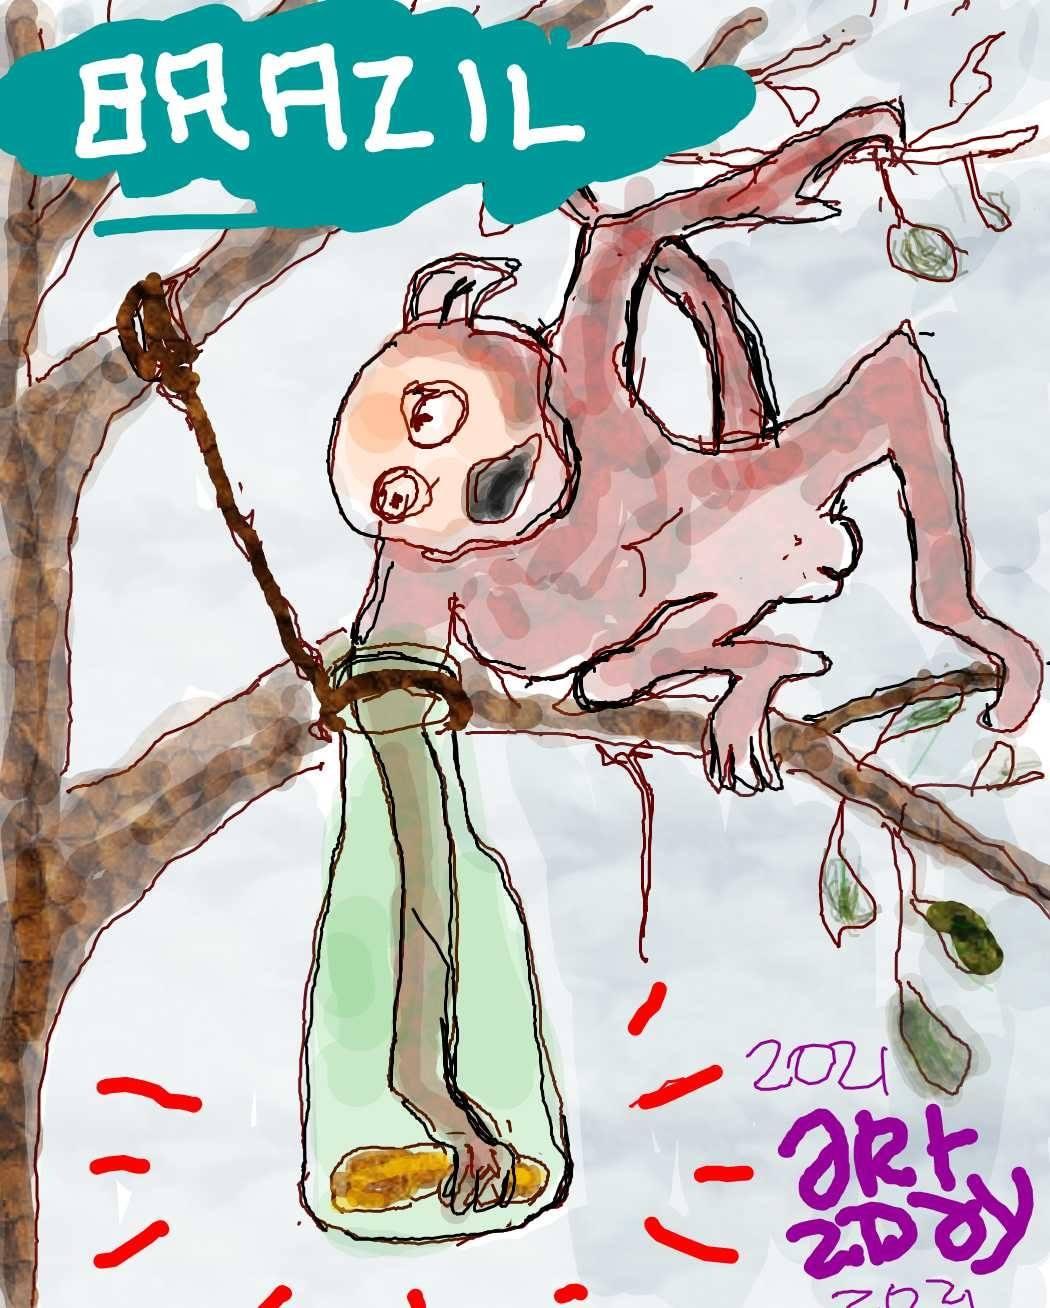 catch a monkey